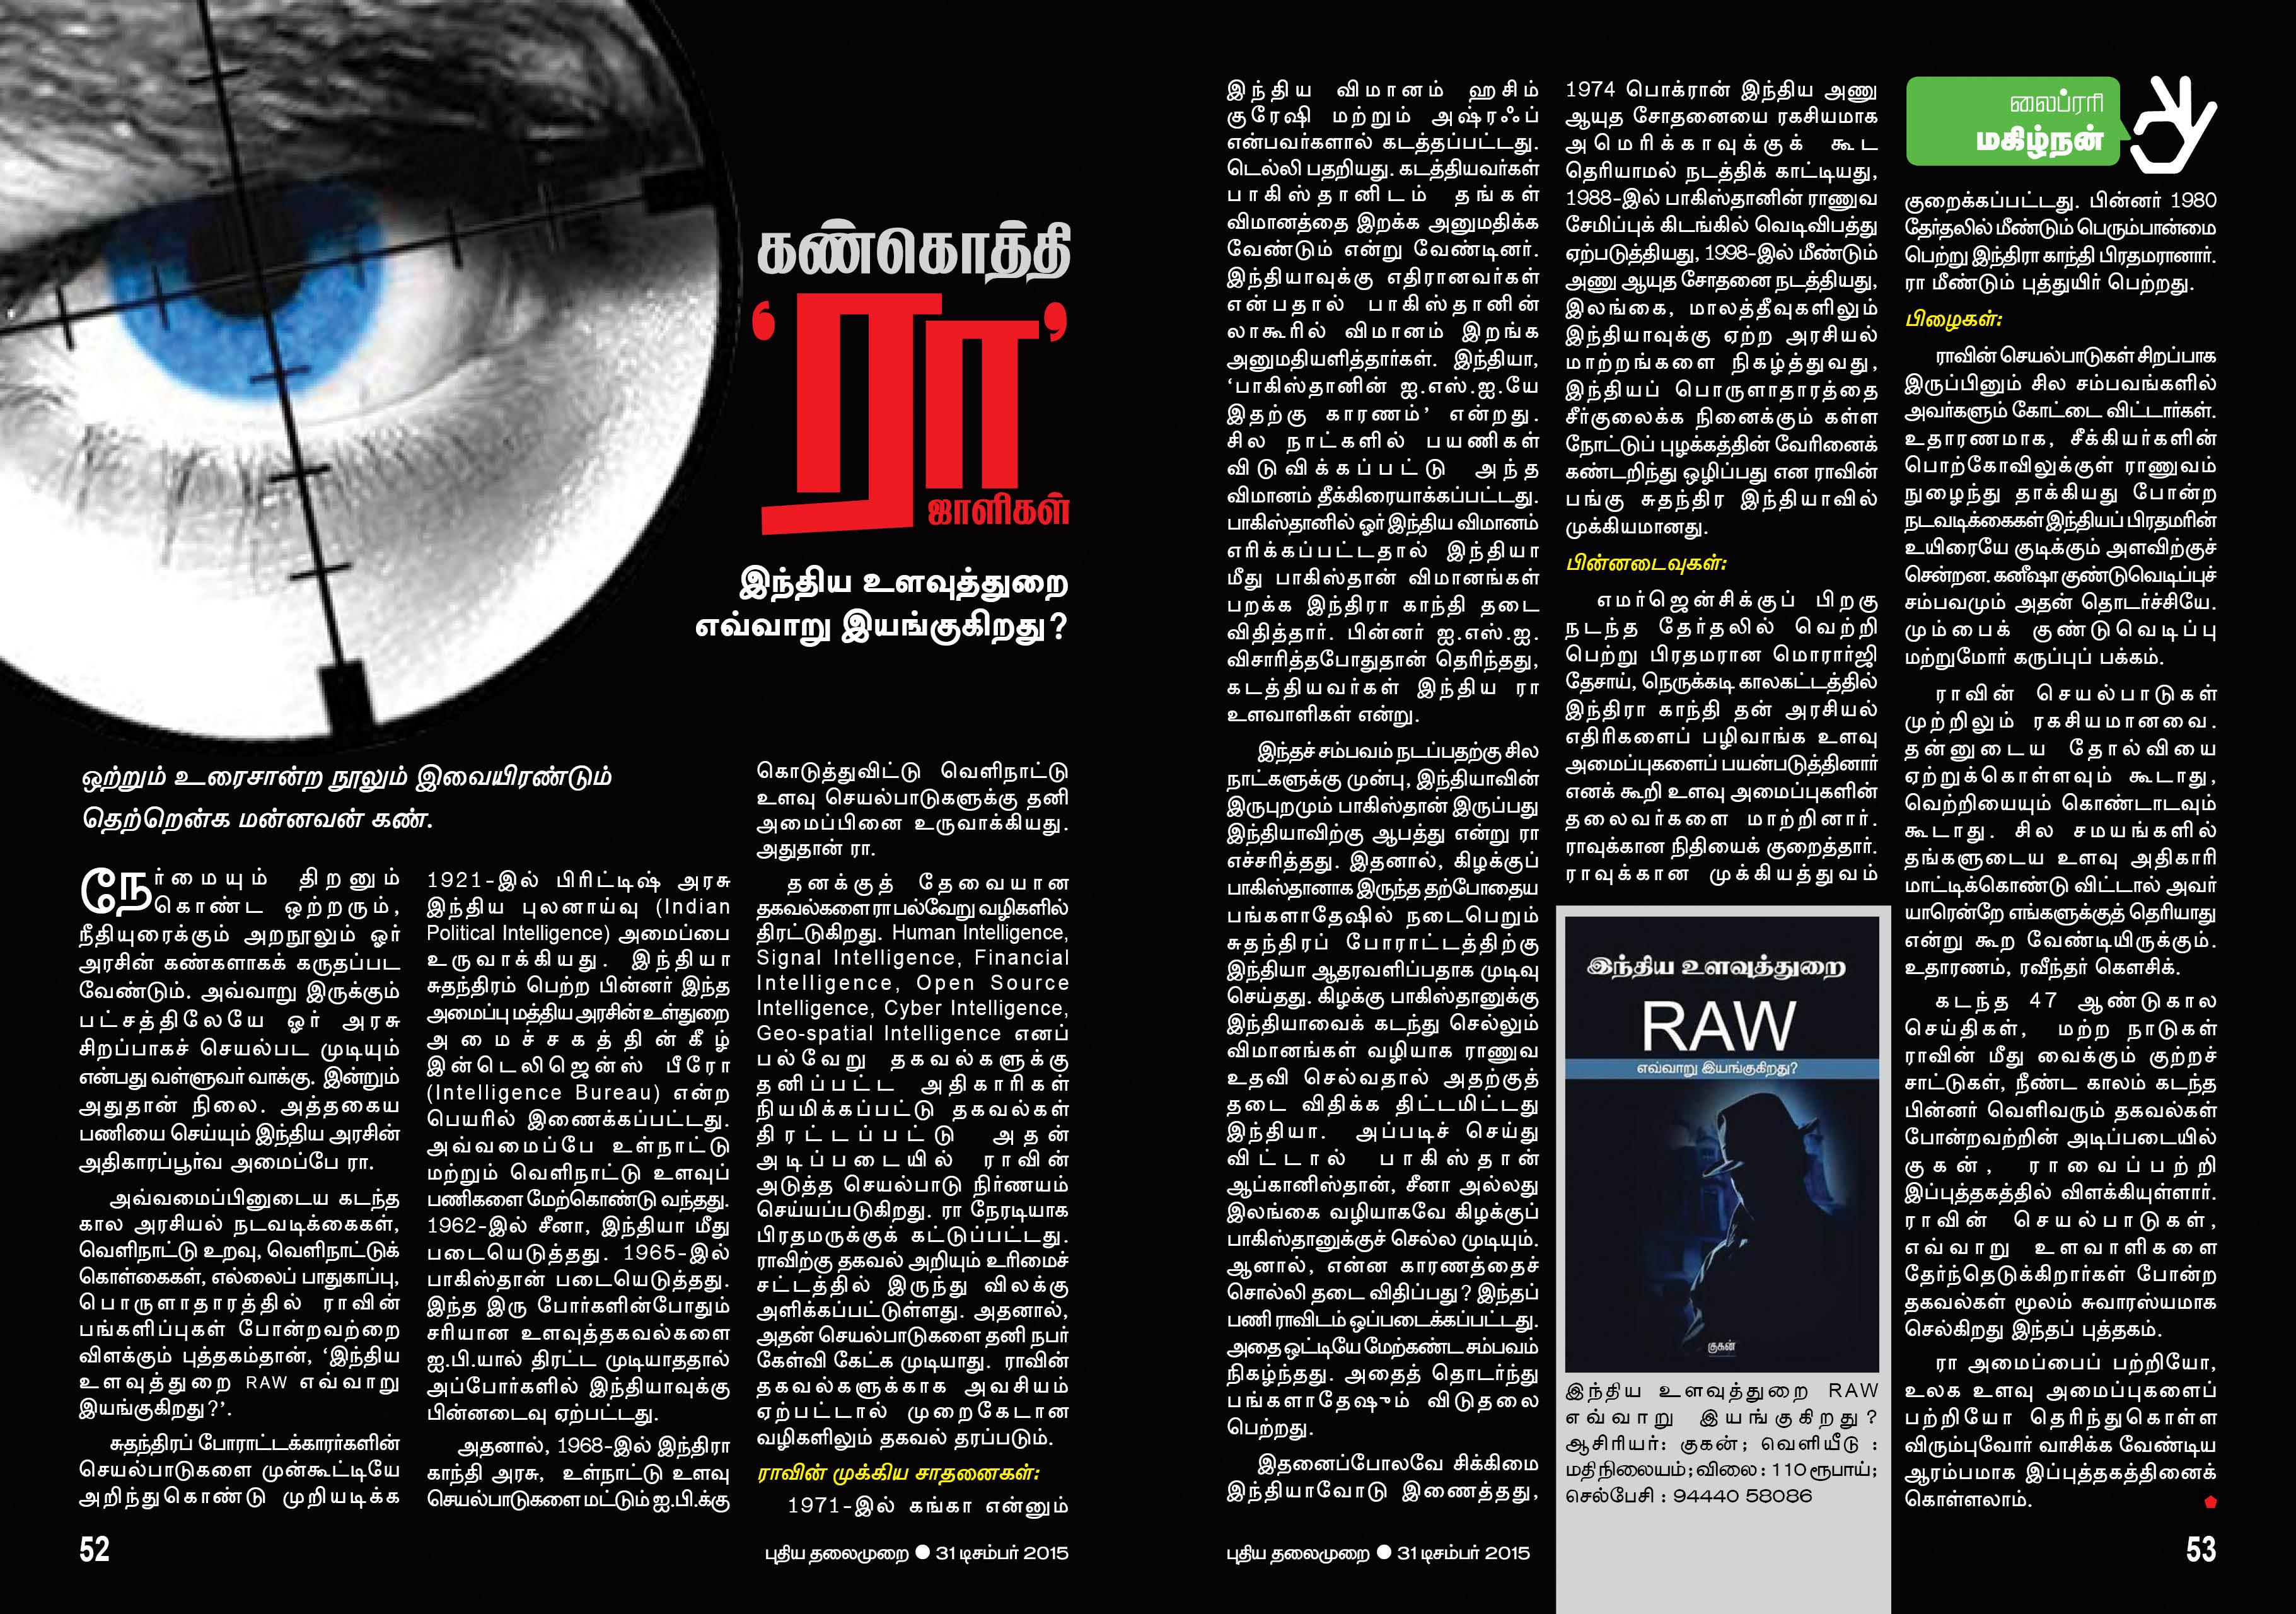 Raa book review